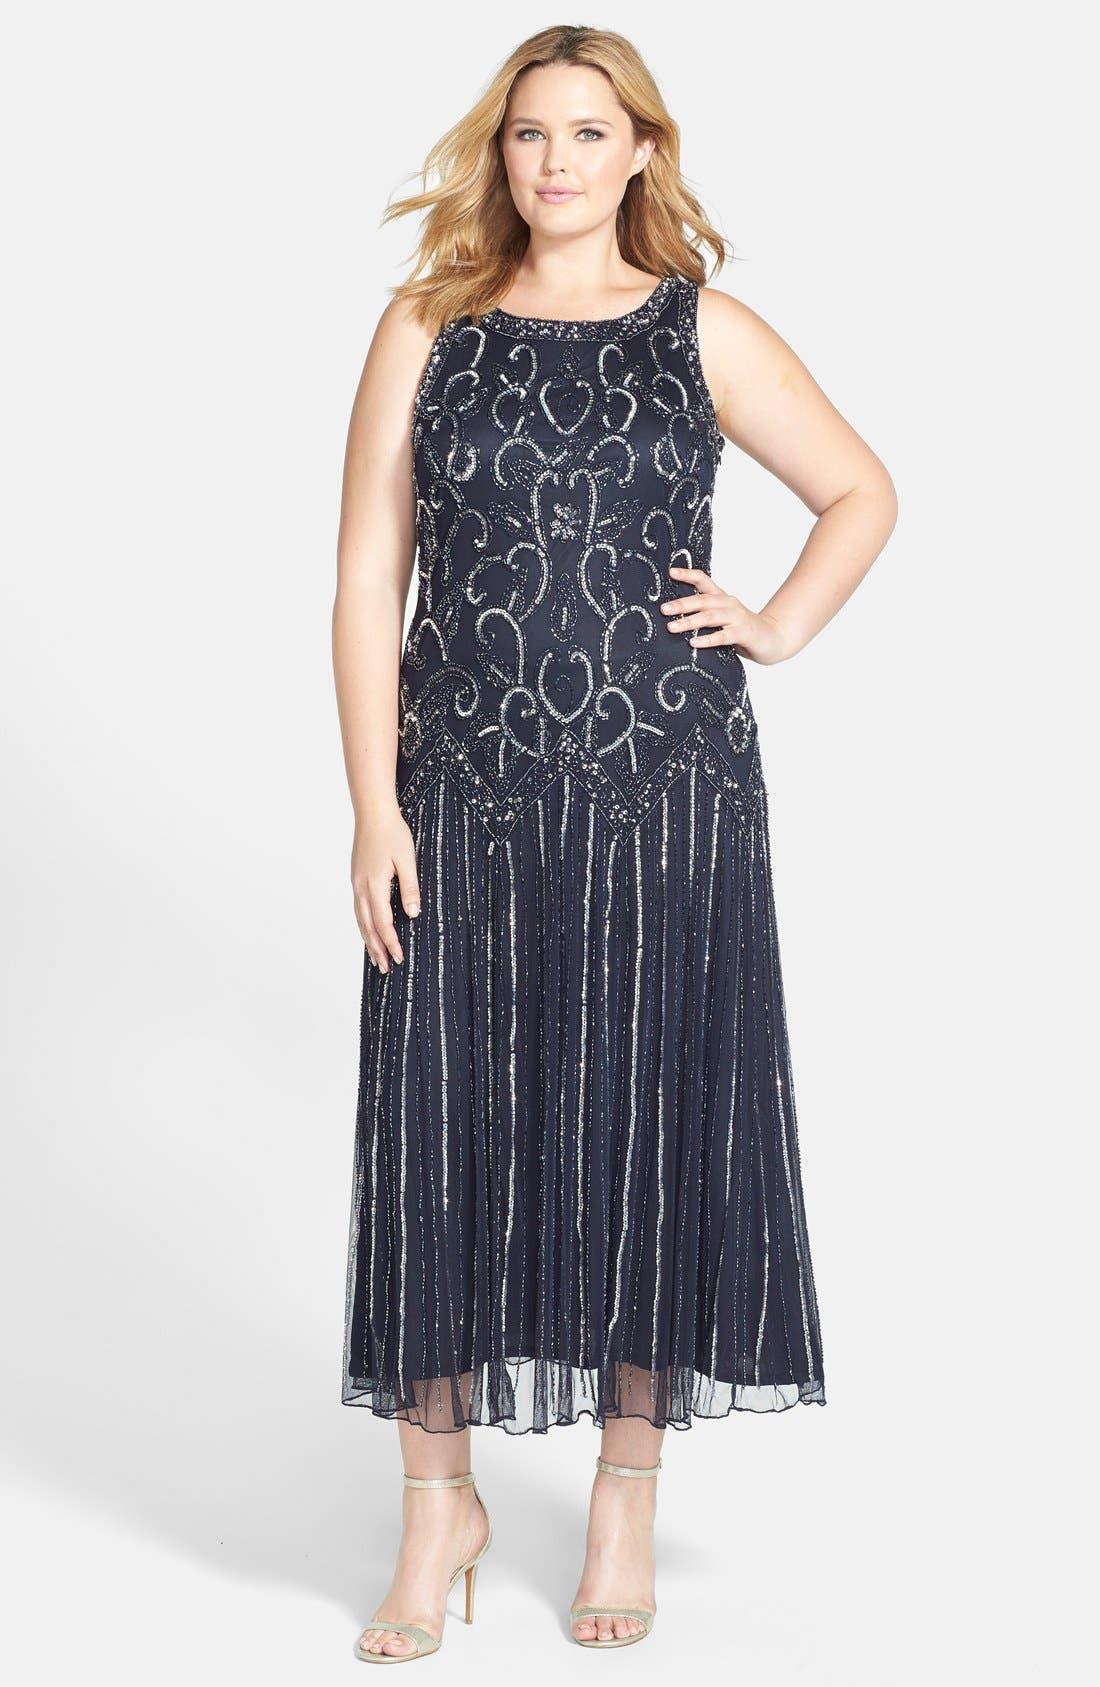 Main Image - Pisarro Nights Embellished Mesh Dress (Plus Size)